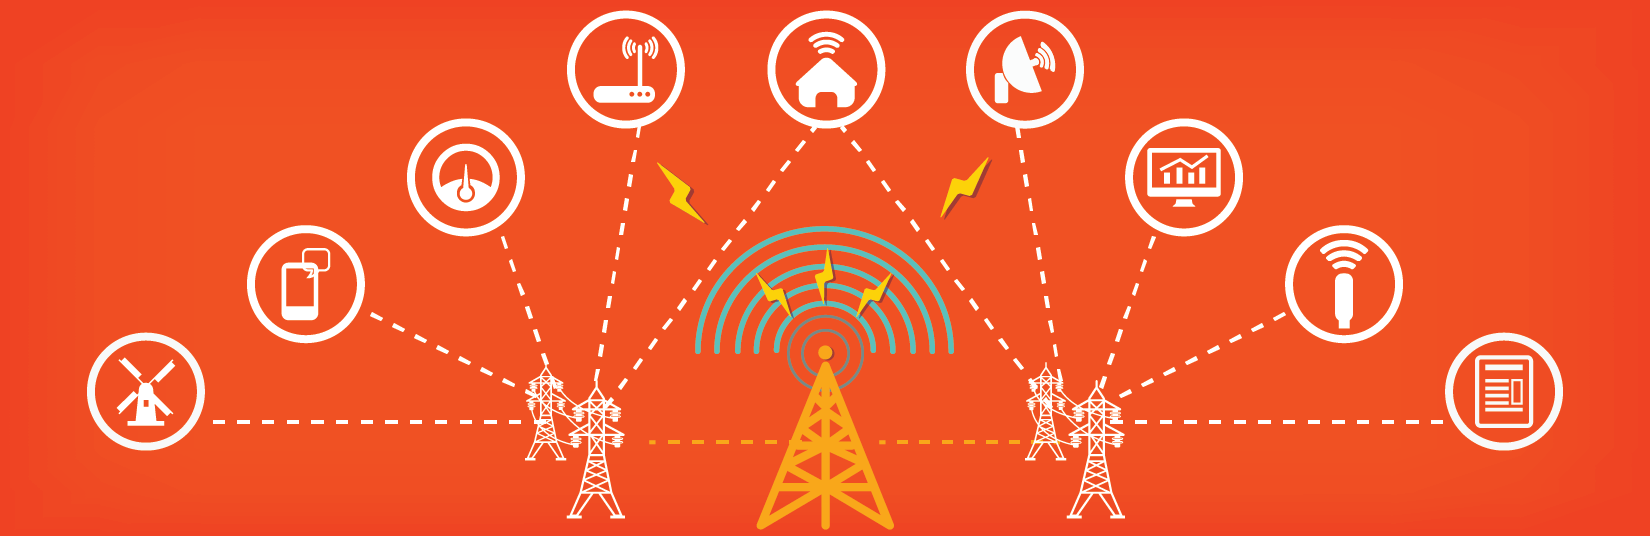 Smart Grid – smarter transmission and distribution of electricity